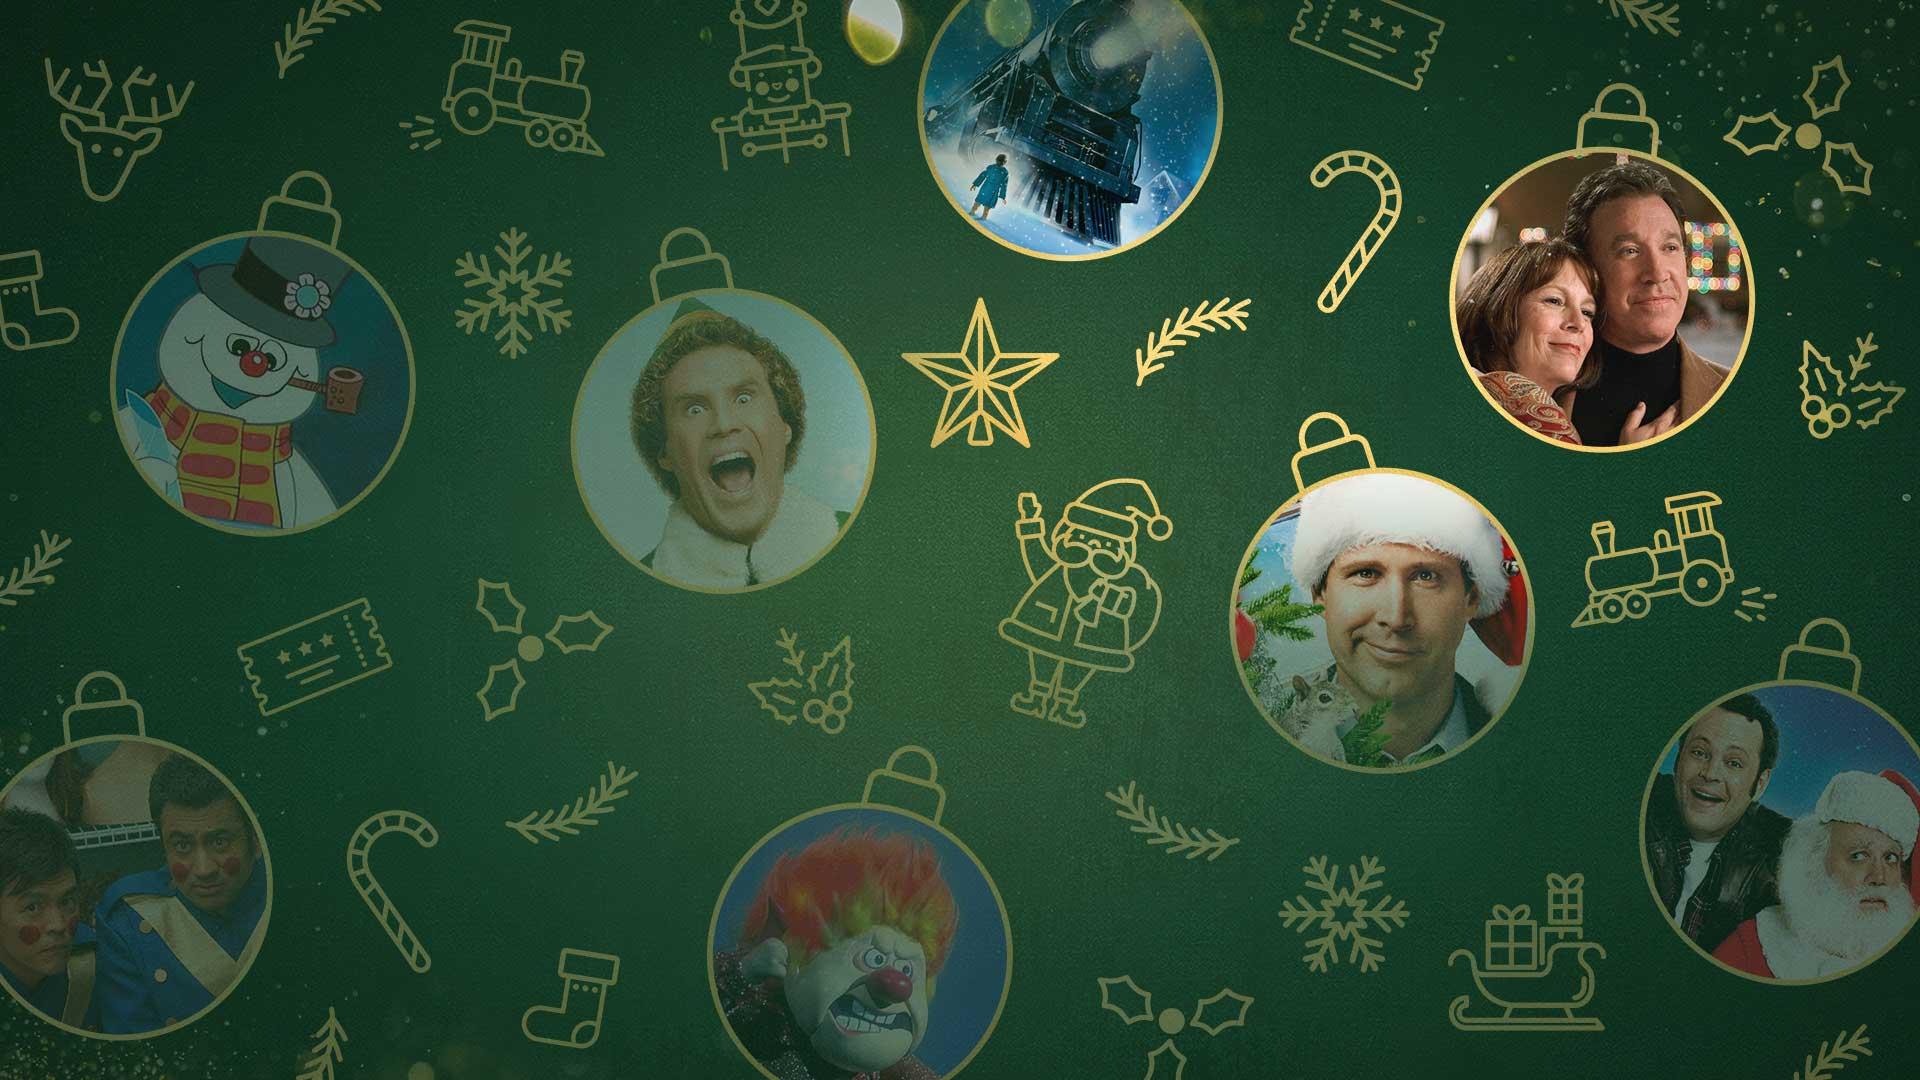 Amc Best Christmas Ever 2020 Schedule Best Christmas Ever Videos   AMC